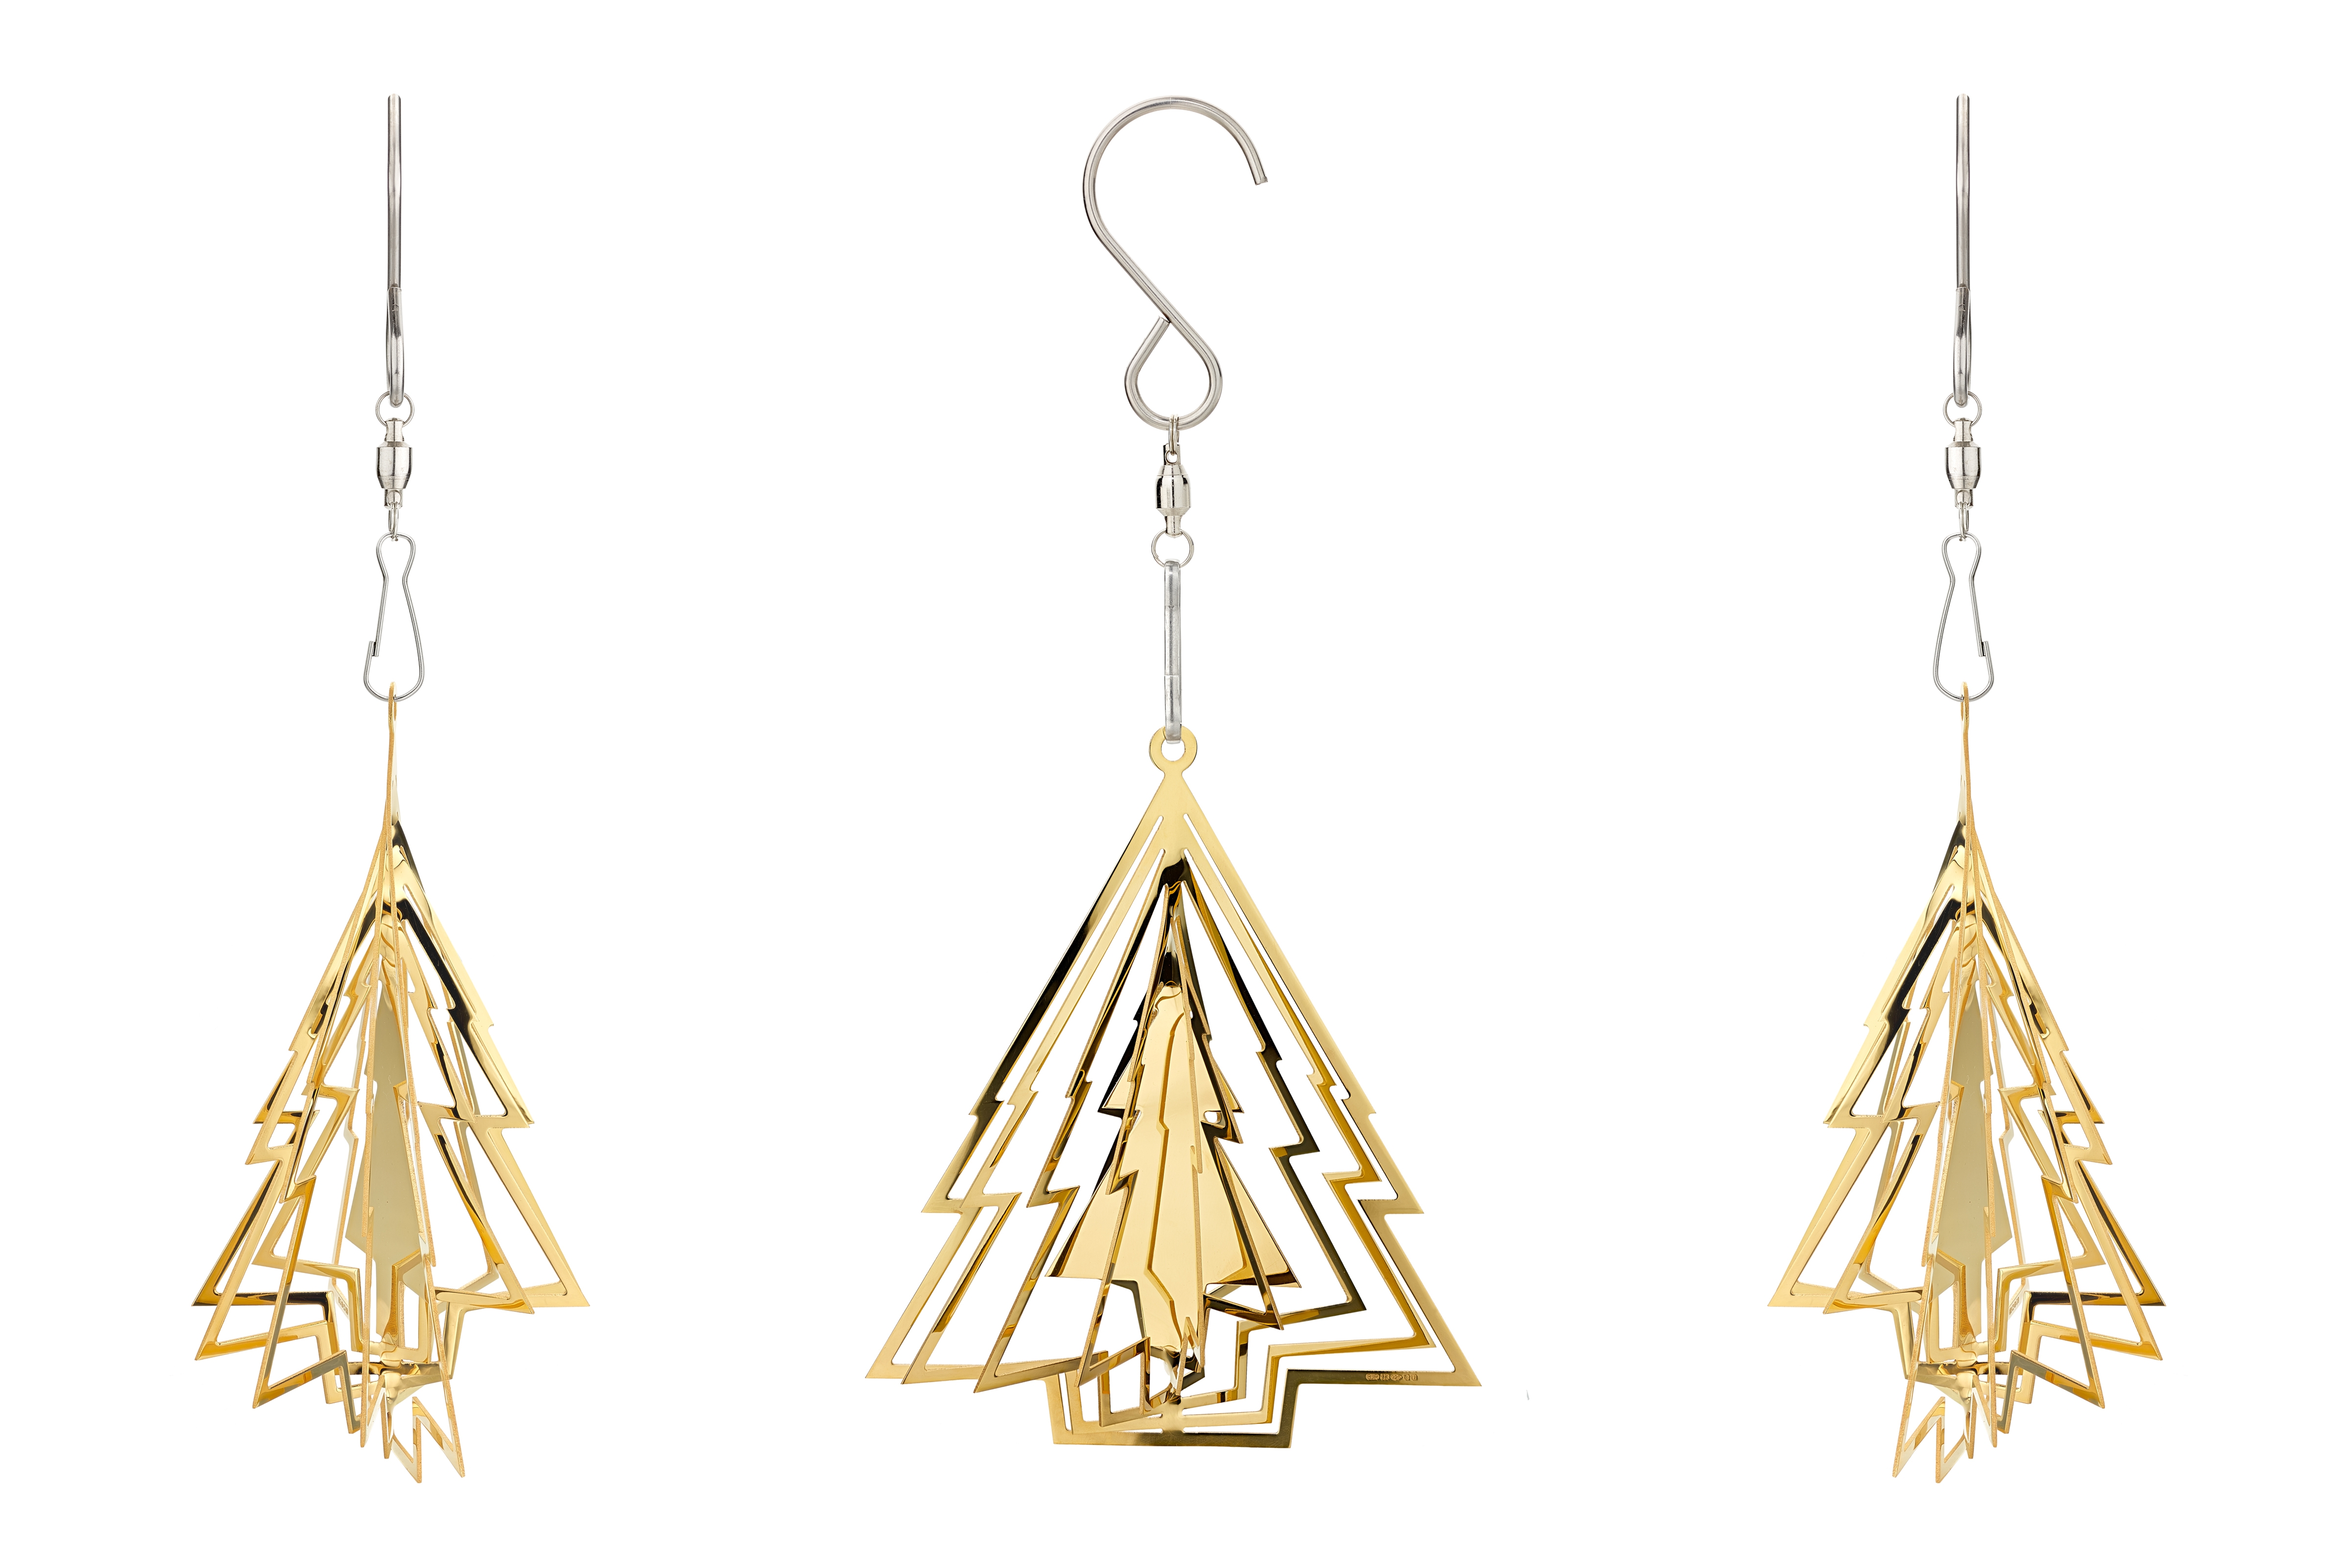 Twistmas Decoration – Twinkeling Tree 2 – Copyright BJRdesigns